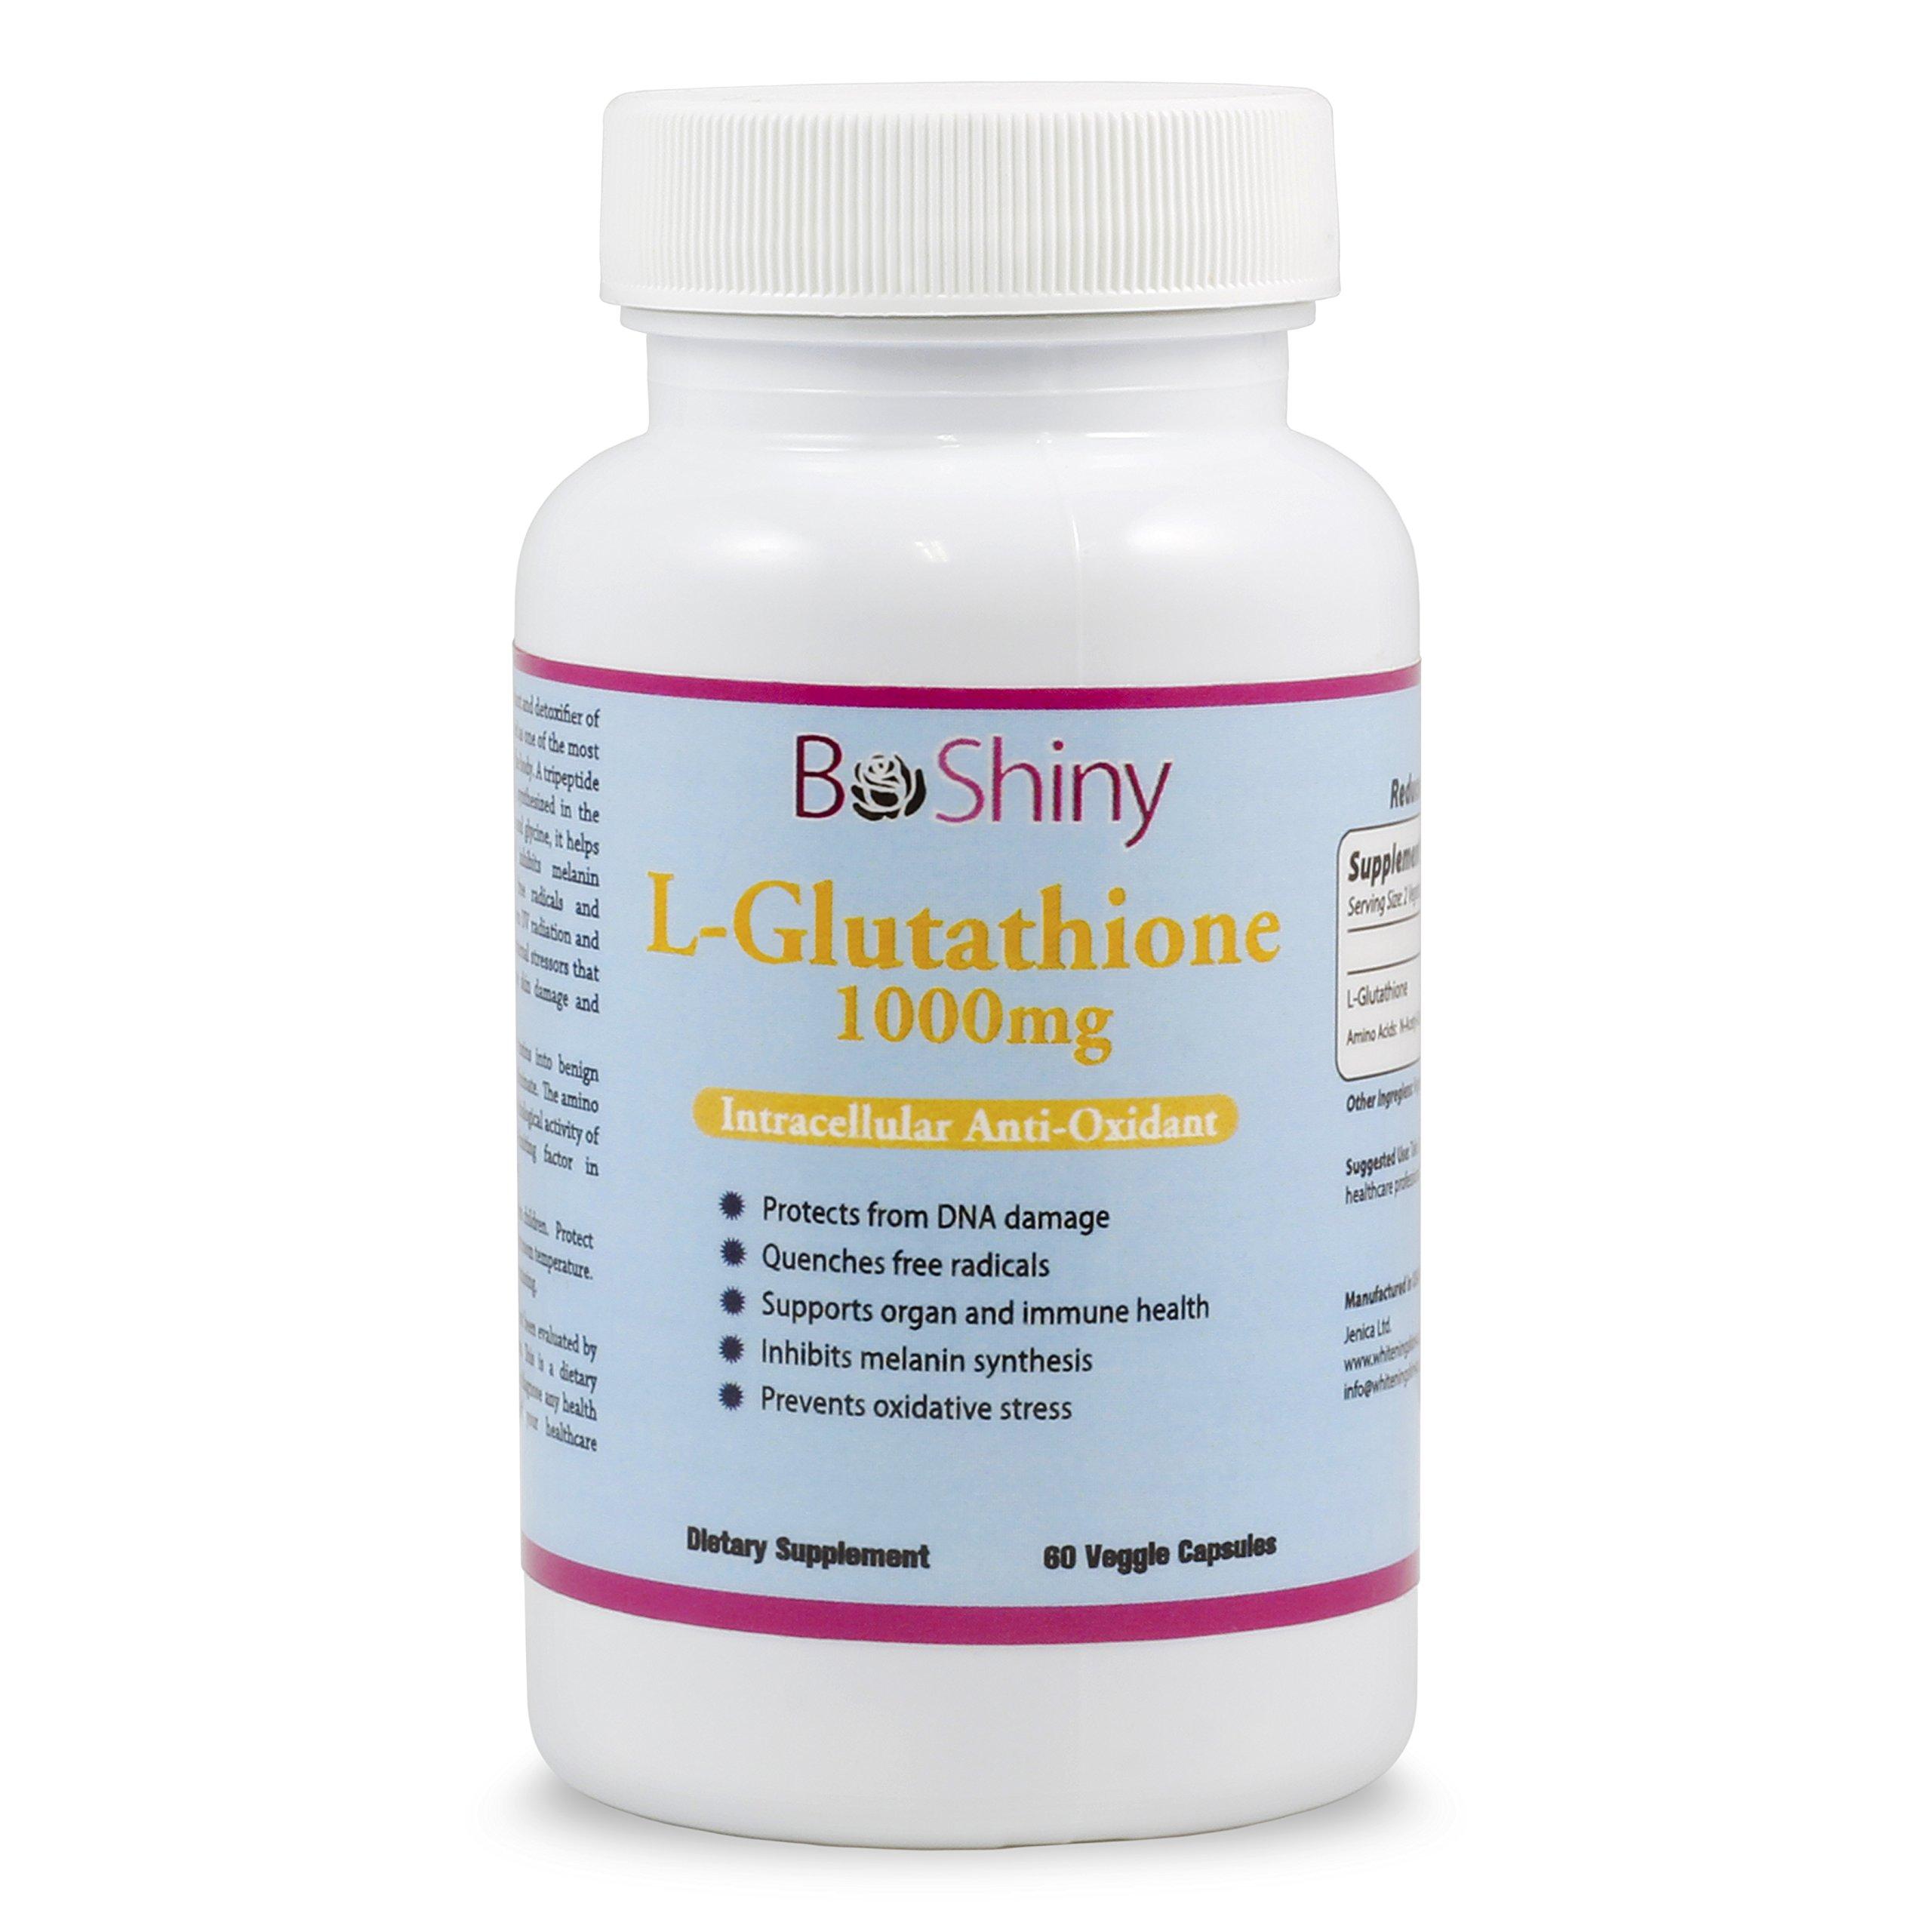 L Glutathione Skin Lightening Brightening Pills 1000 mg Antioxidant Anti Aging to Support Liver Health & Detox Help Immune & Brain Function Reduce Free Radical Damage Vegan 60 Capsules